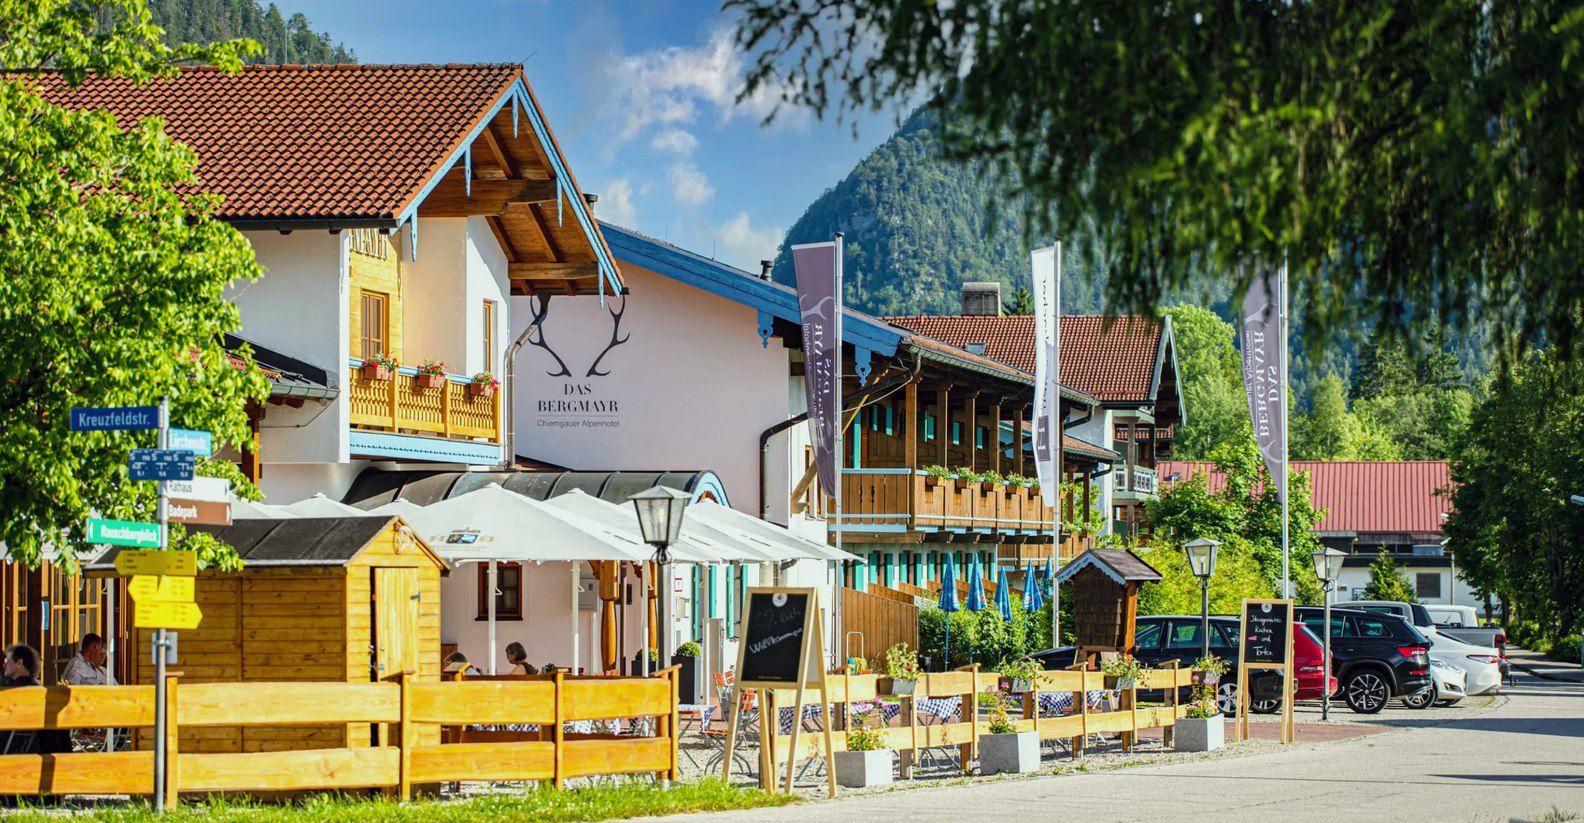 ÜN im Chiemgau in Alpenhotel inkl. Frühstück, Wellness & mehr ab 34€ p.P.